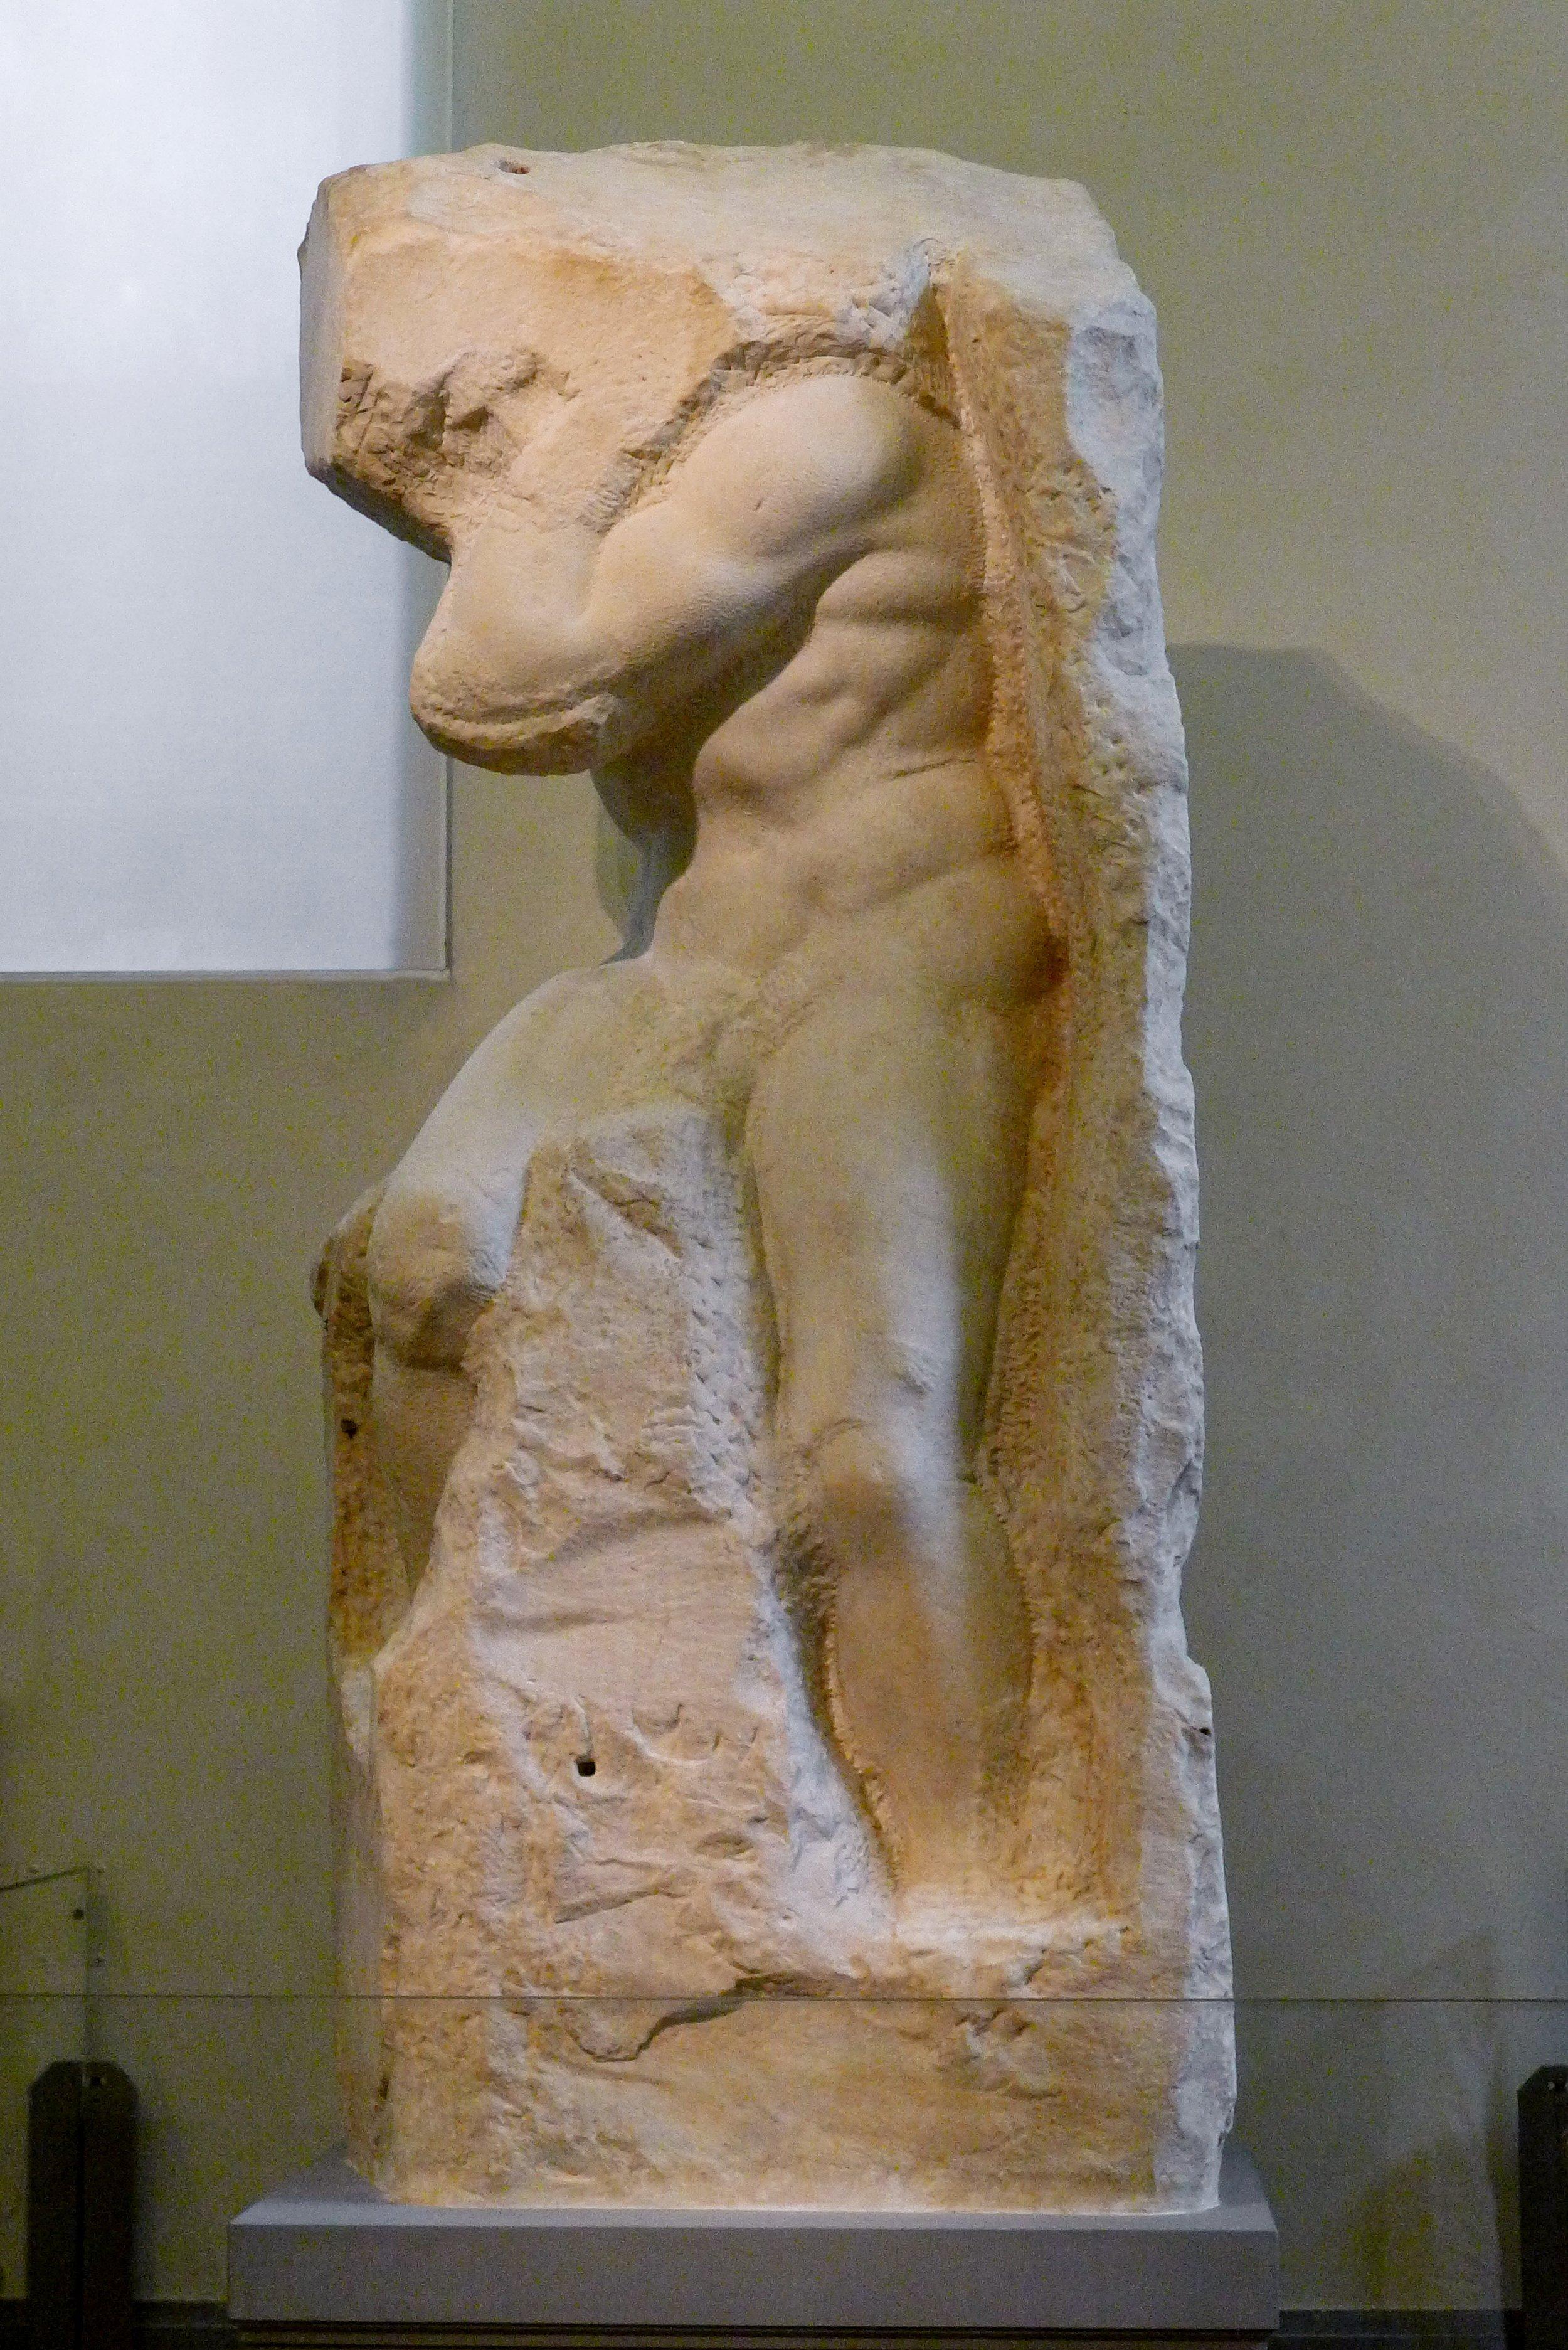 'Atlas_Slave'_by_Michelangelo_-_JBU_01.jpg